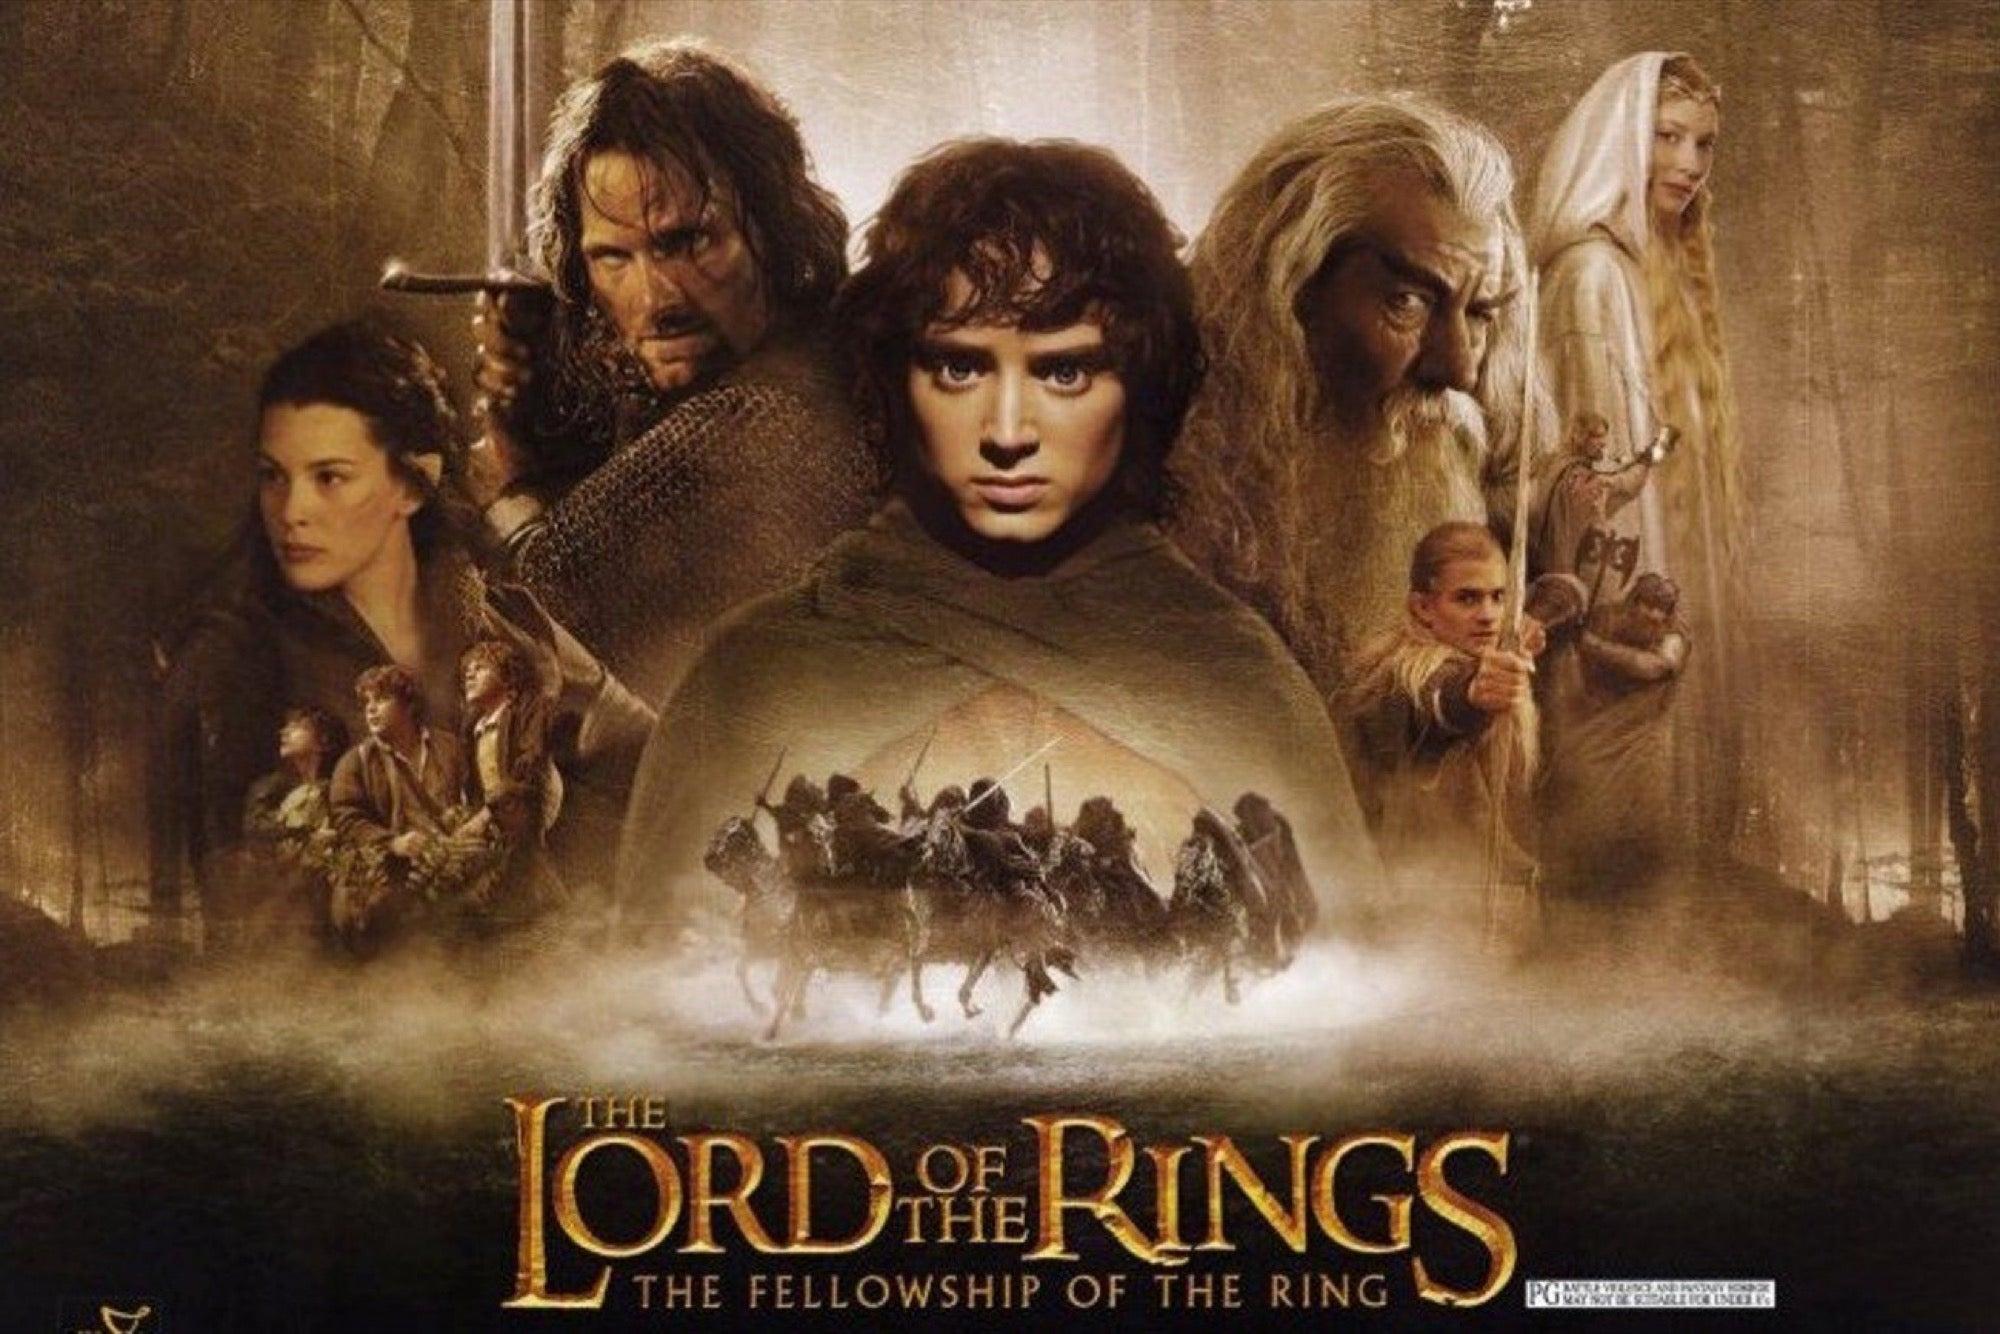 سلاسل أفلام - The Lord of the Rings